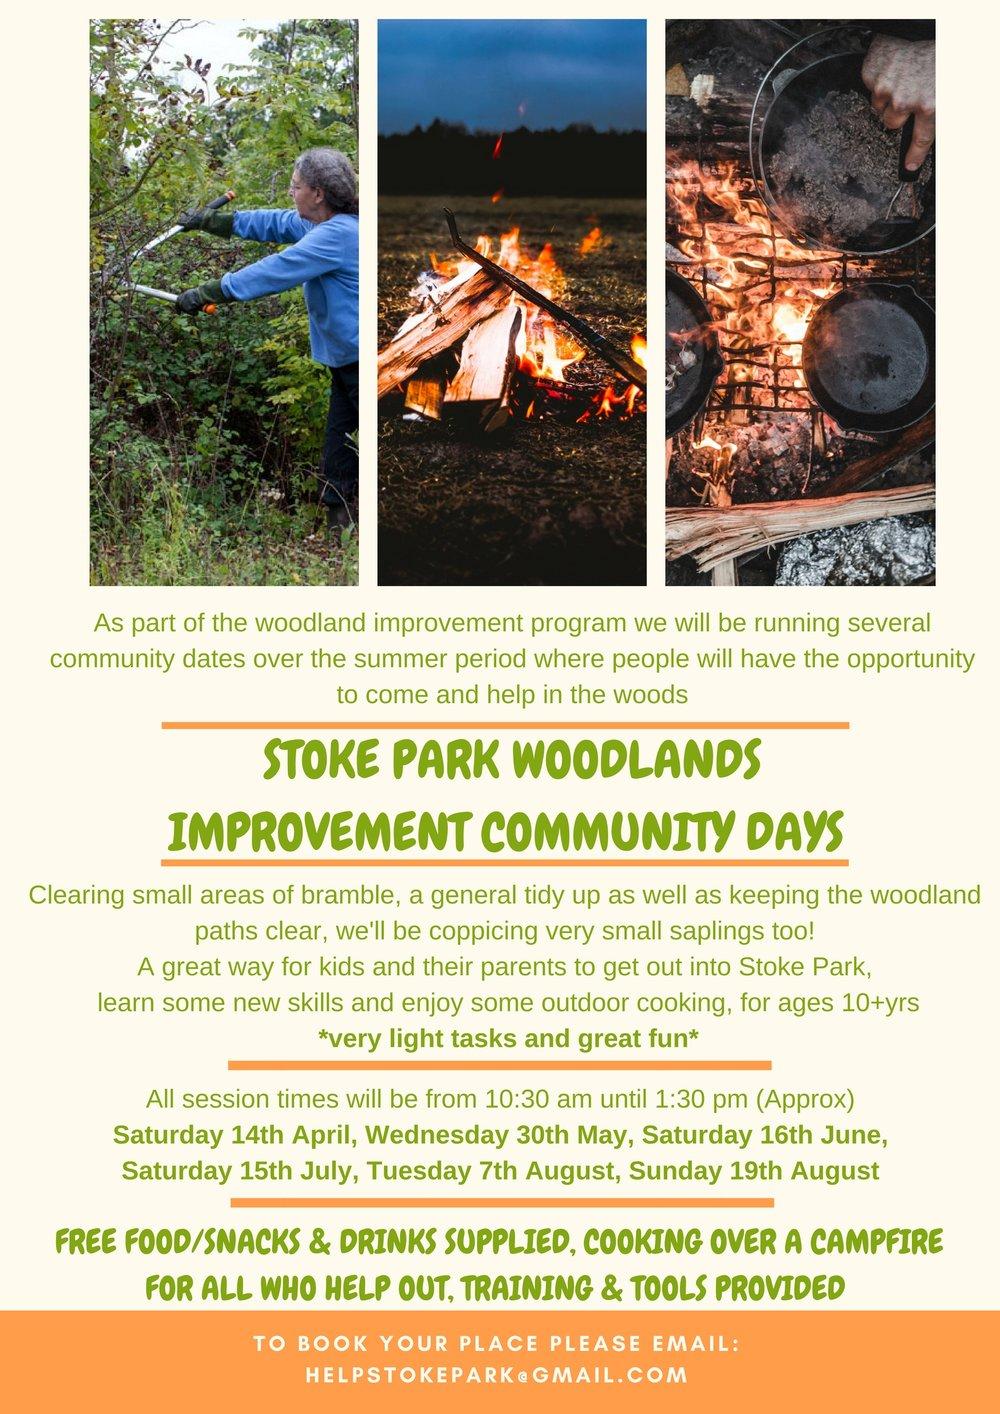 Stoke park woodlands improvement community days.jpg